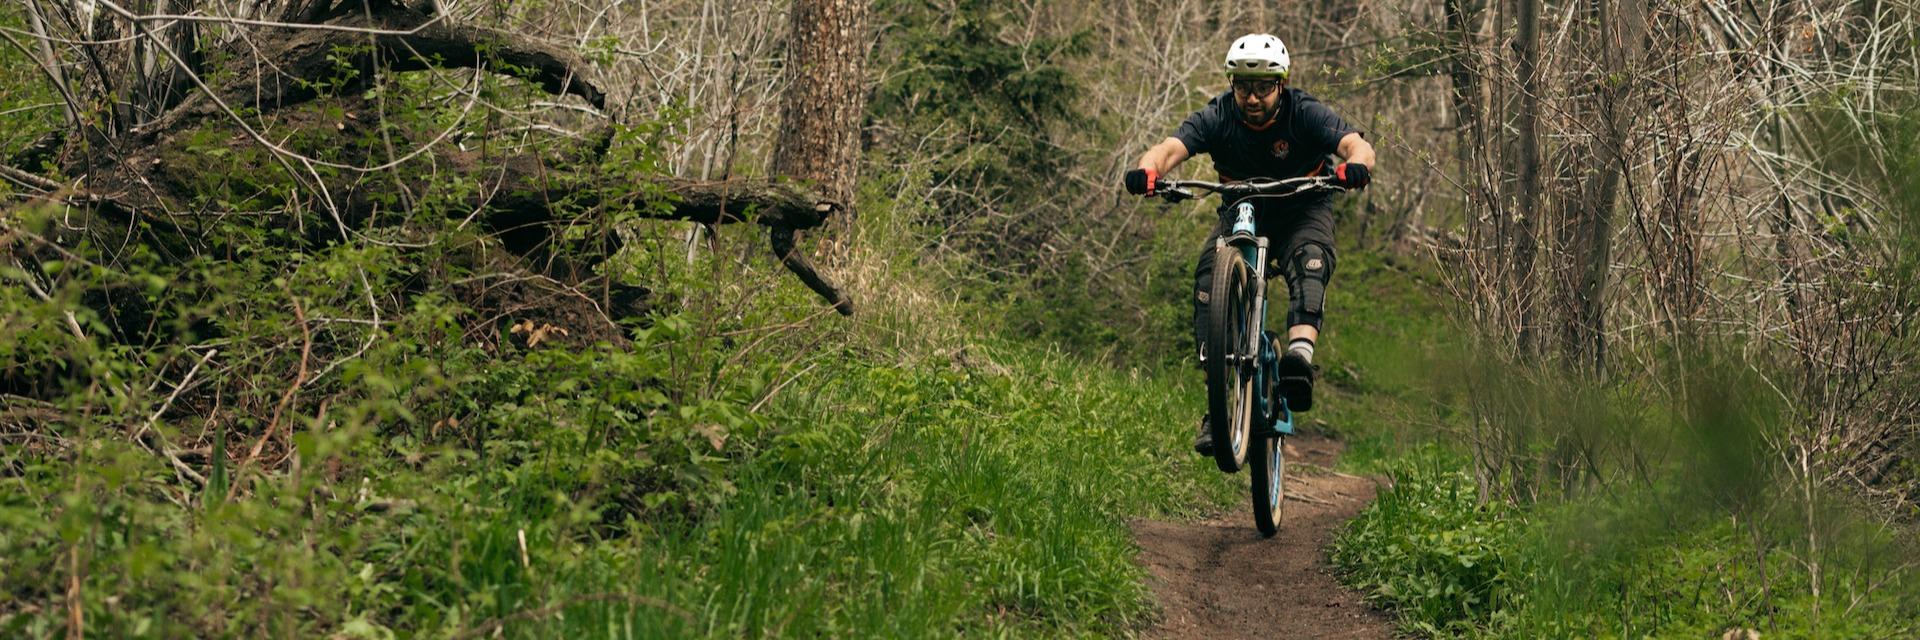 Man doing a wheelie on a mountain bike on a wooded trail